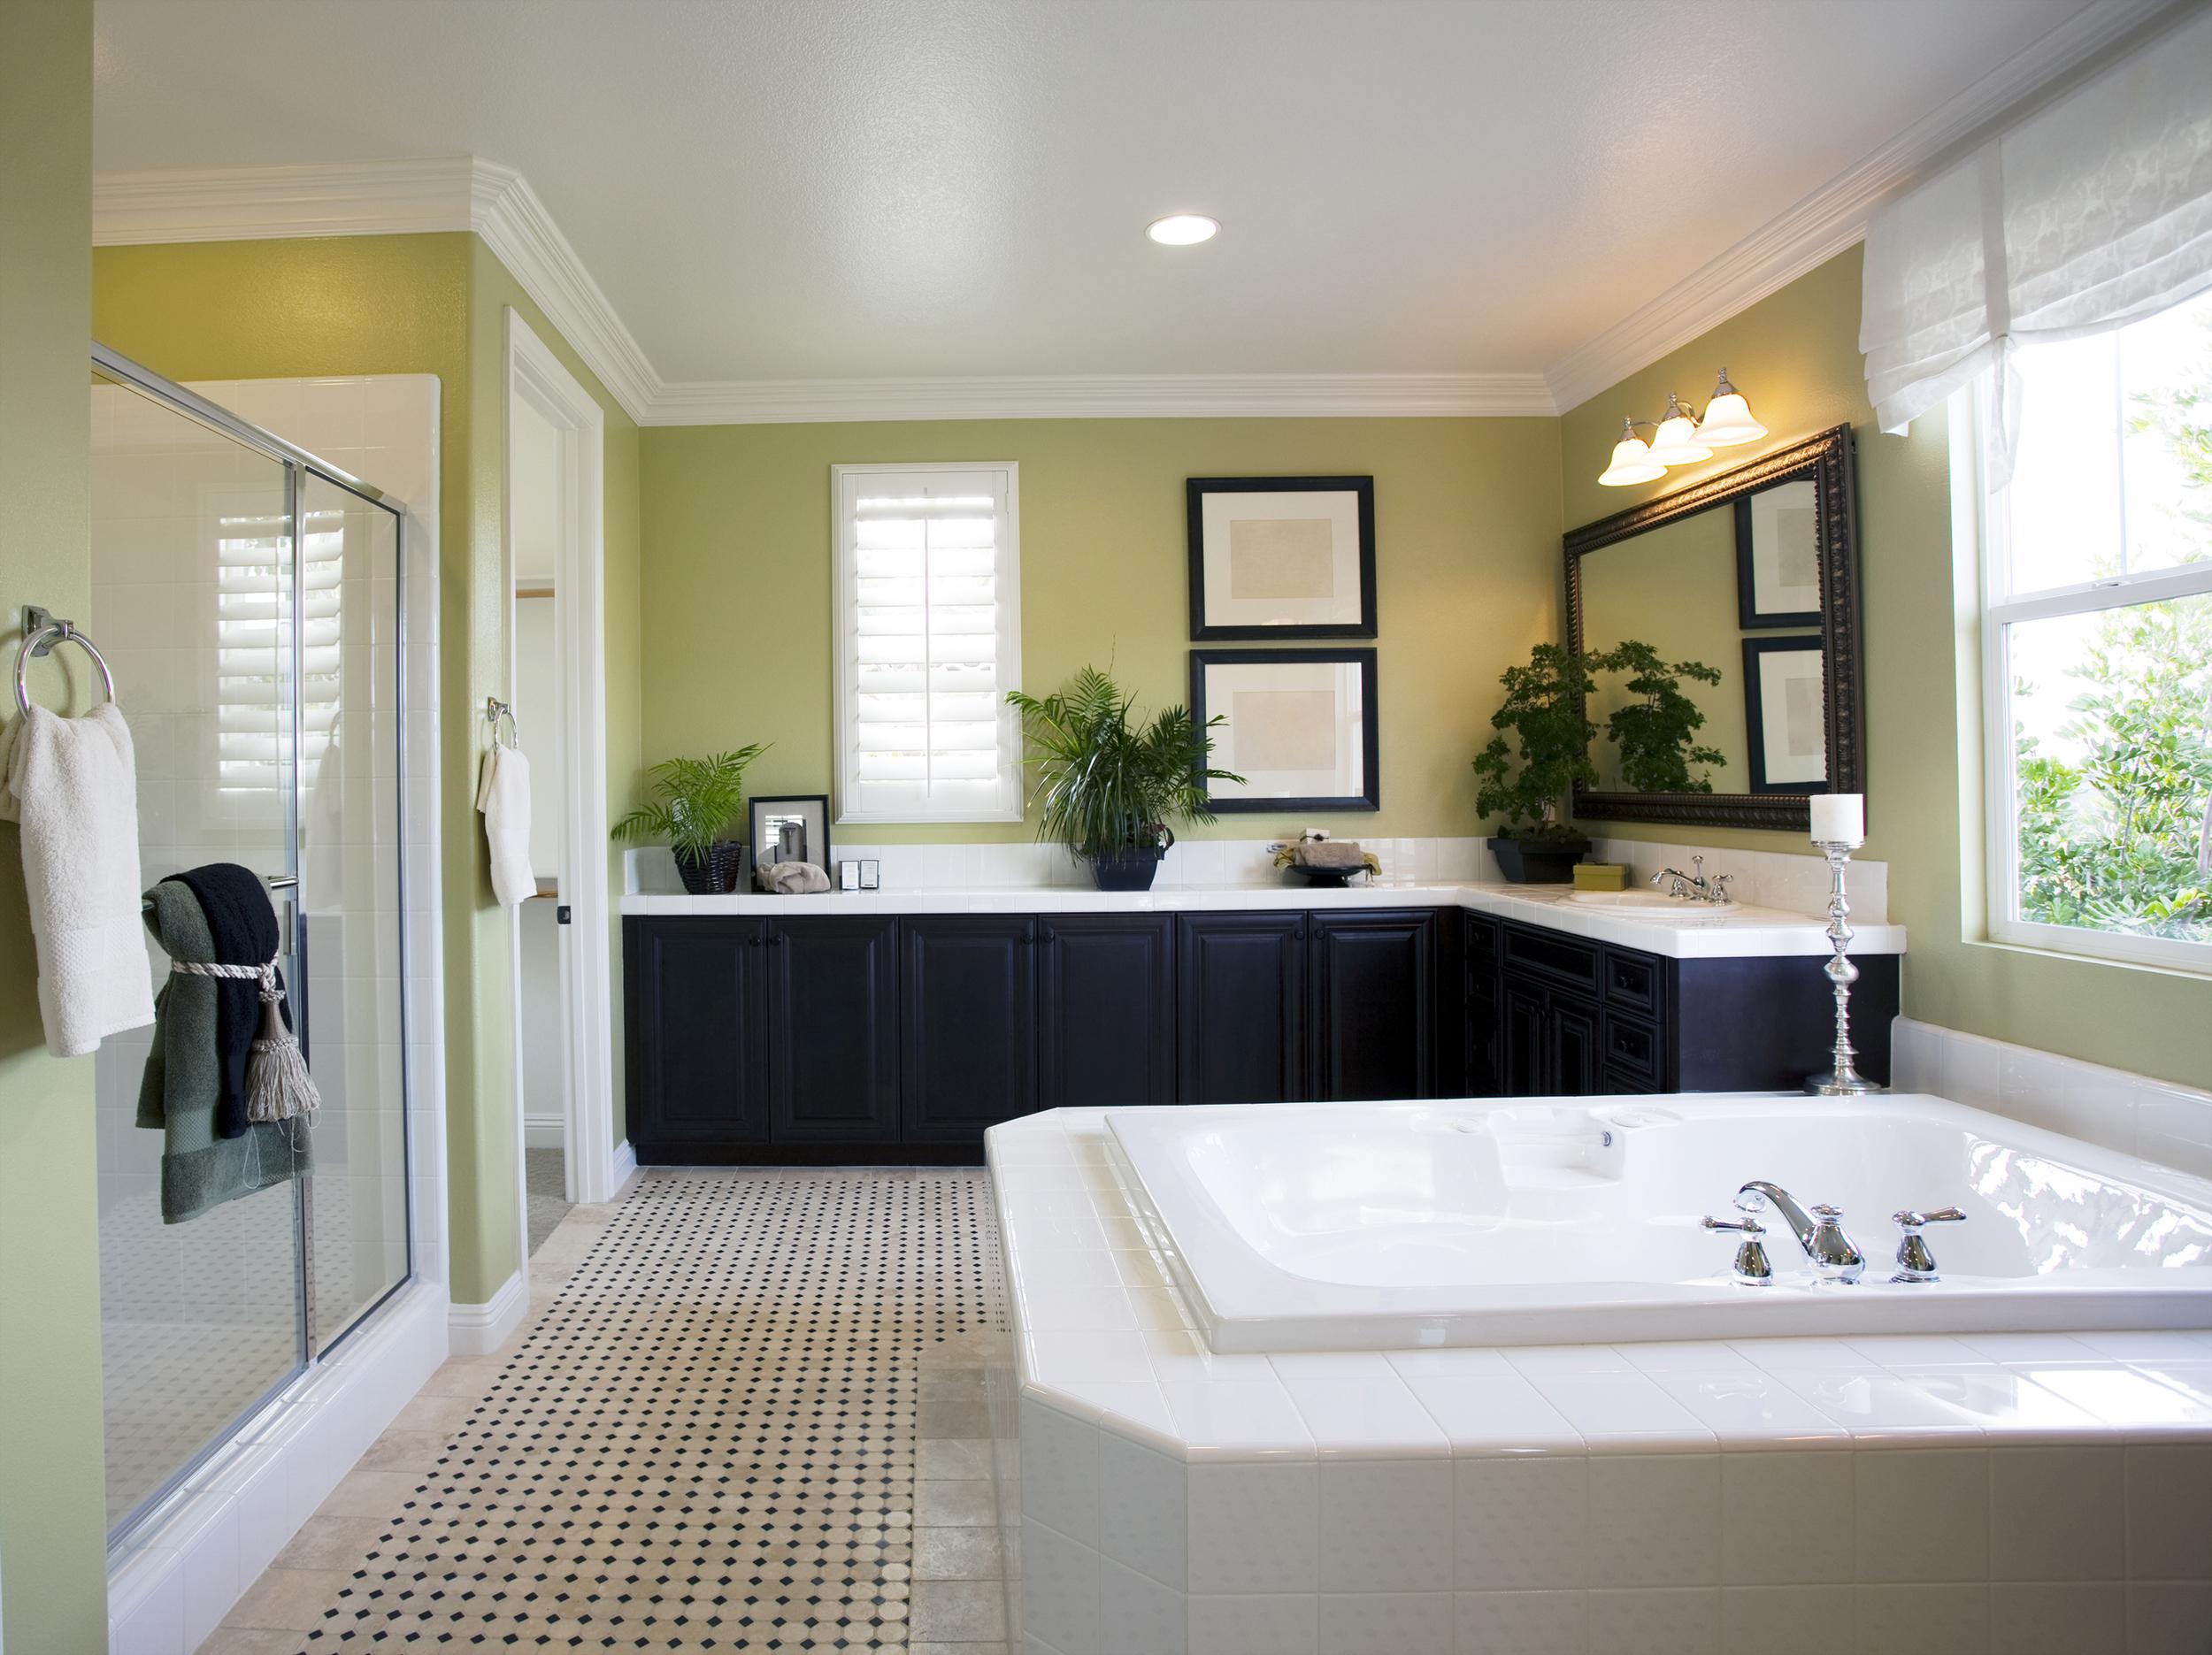 Mclintock bath.jpg